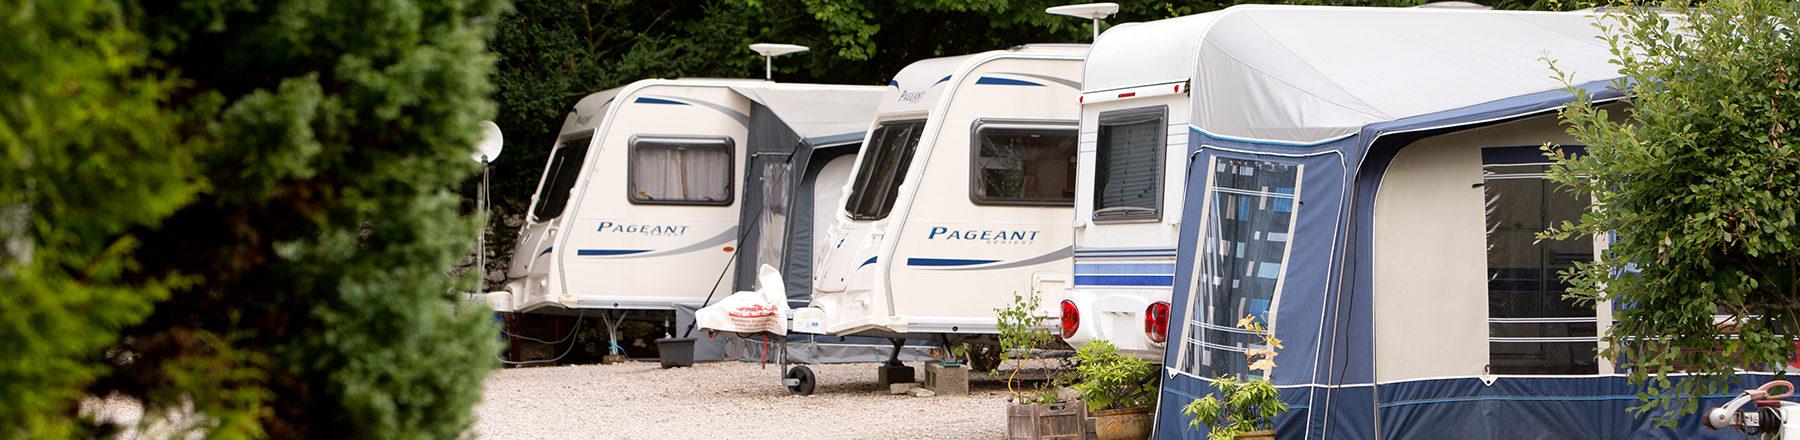 Seasonal Pitches For Touring Caravans Norfolk